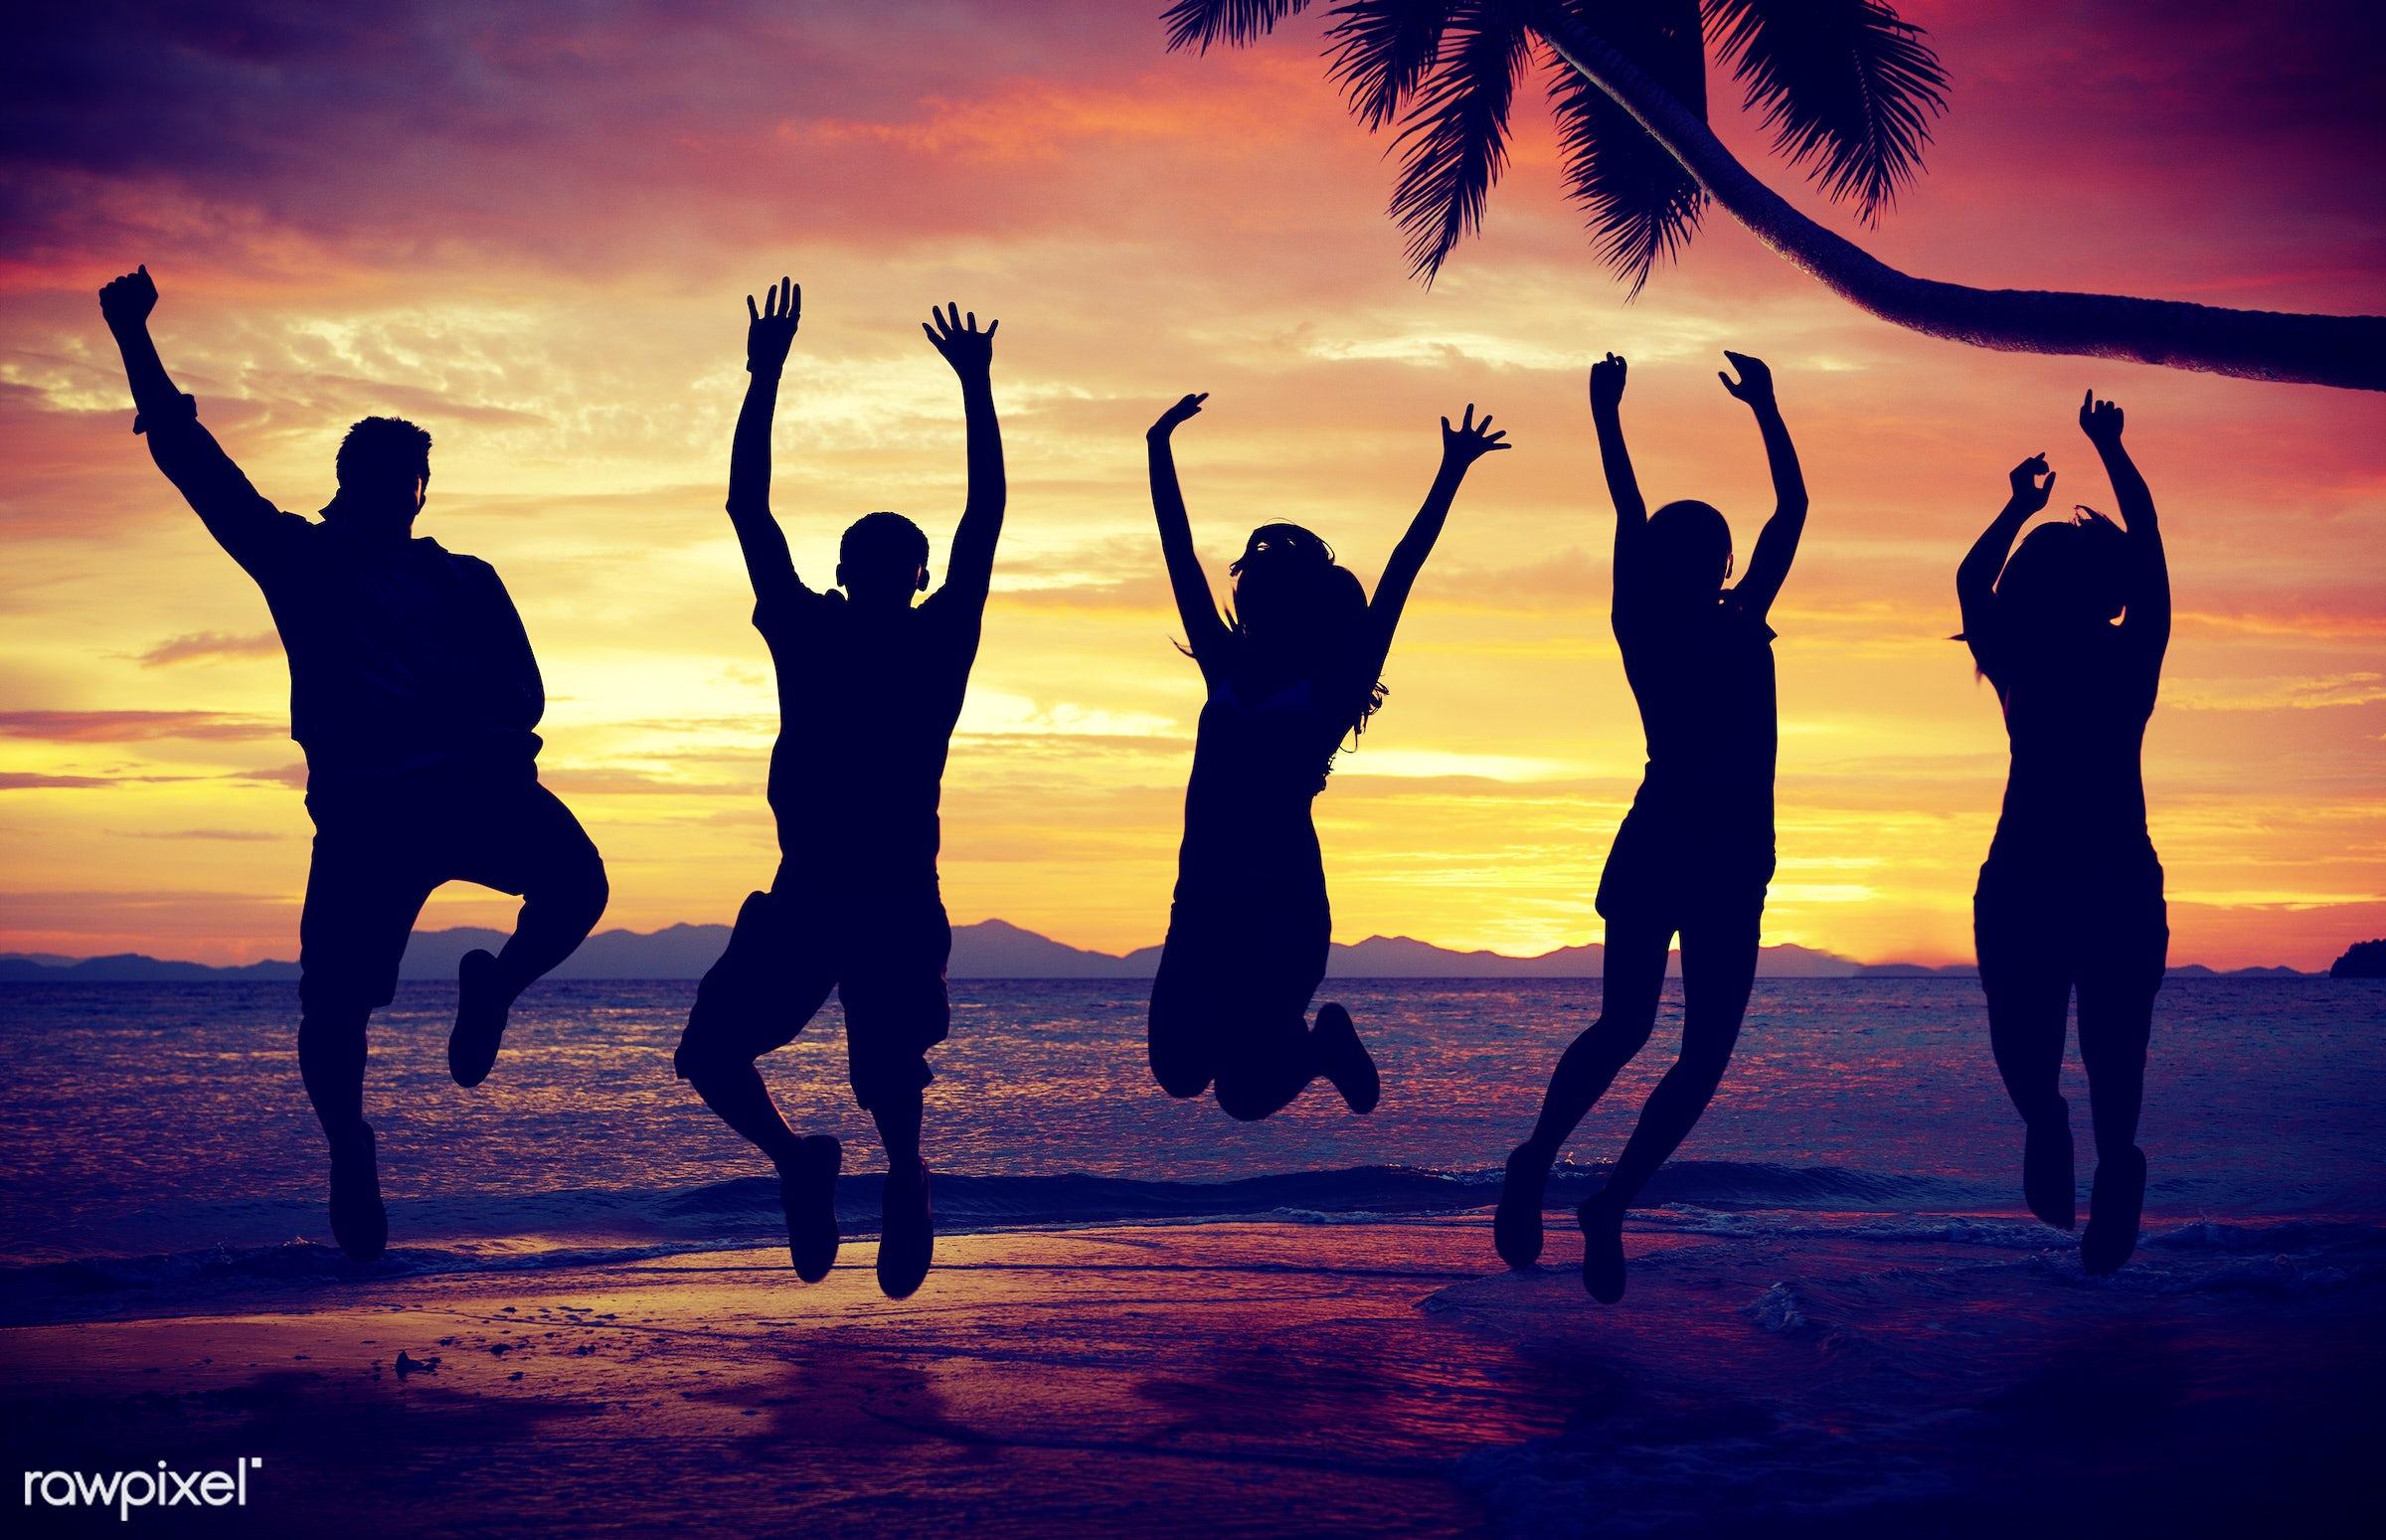 adult, back lit, beach, beach party, celebration, cheerful, cloudscape, community, dusk, ecstatic, enjoyment, freedom,...